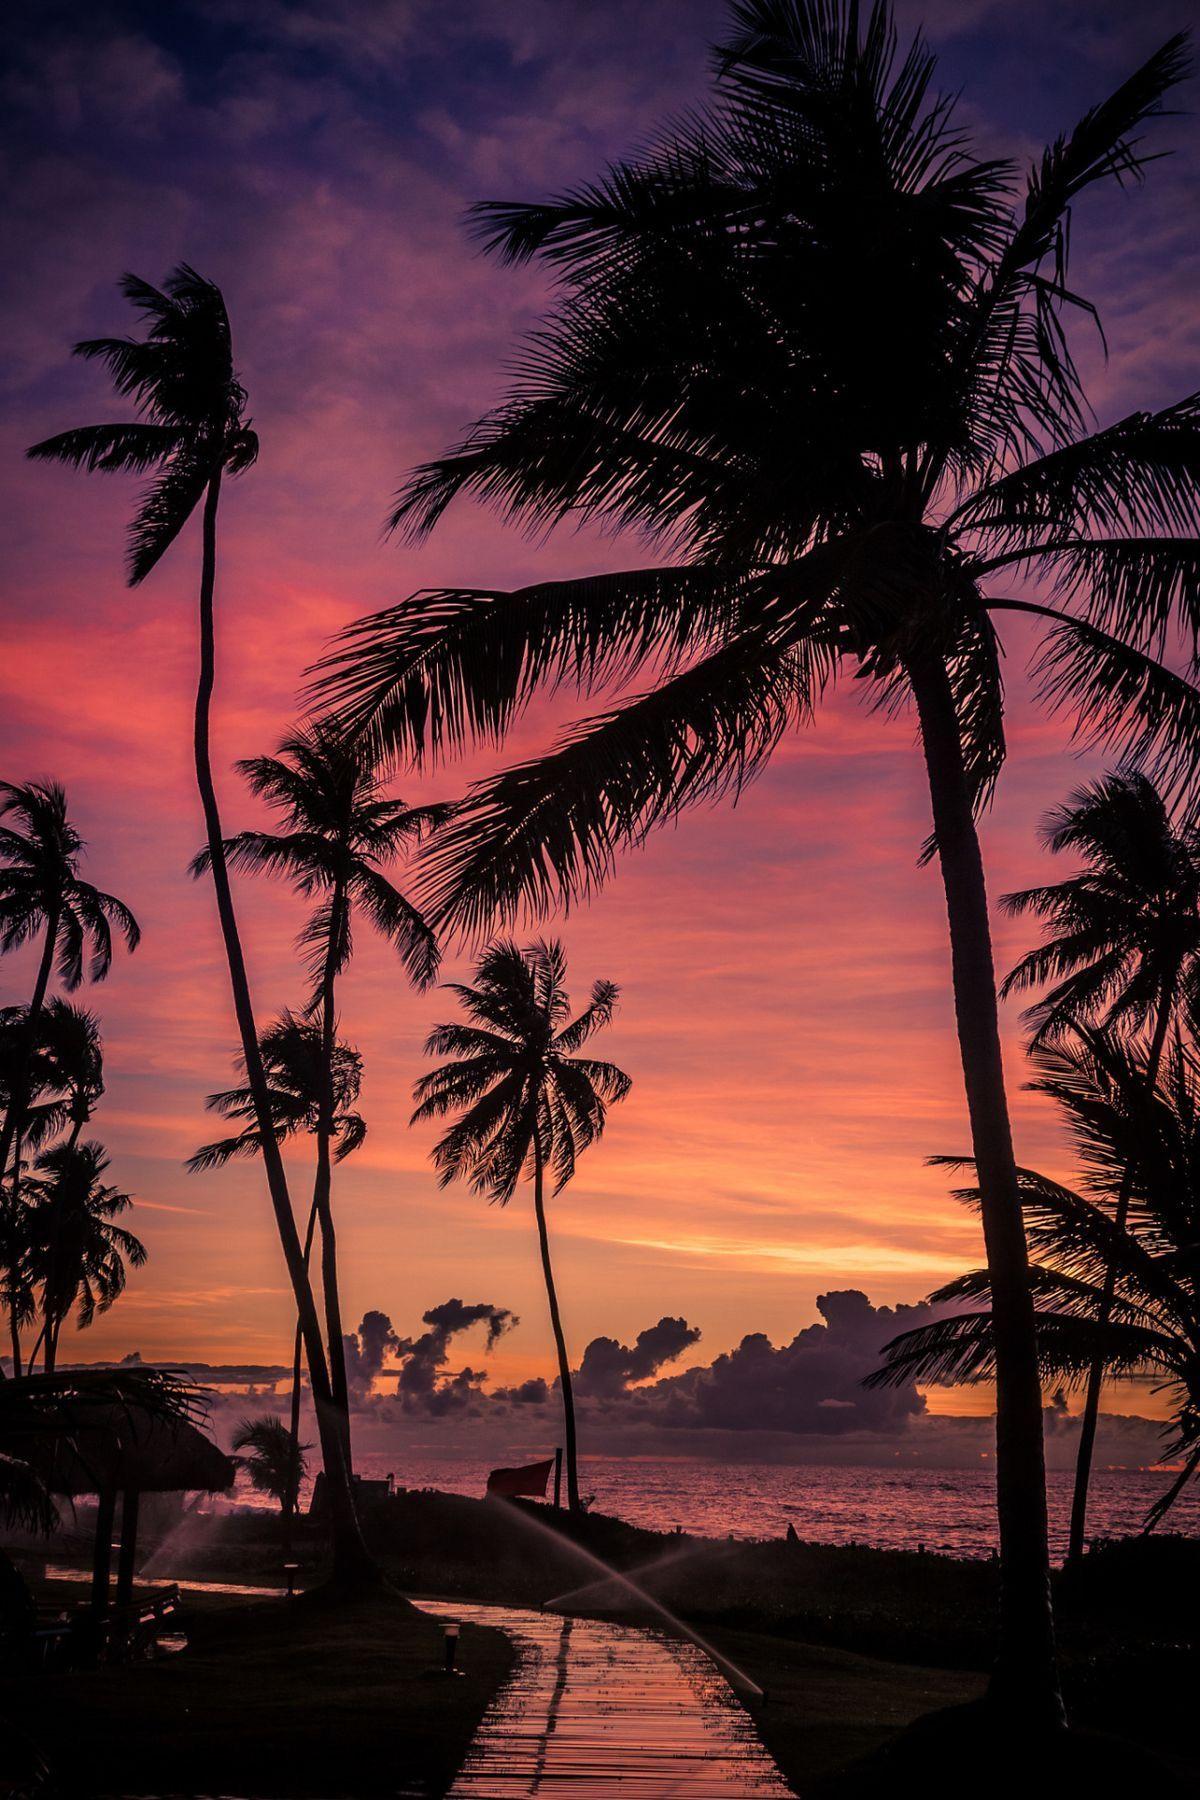 Sunrise At Salvador Bahia Brazil By Marcello Landolfi